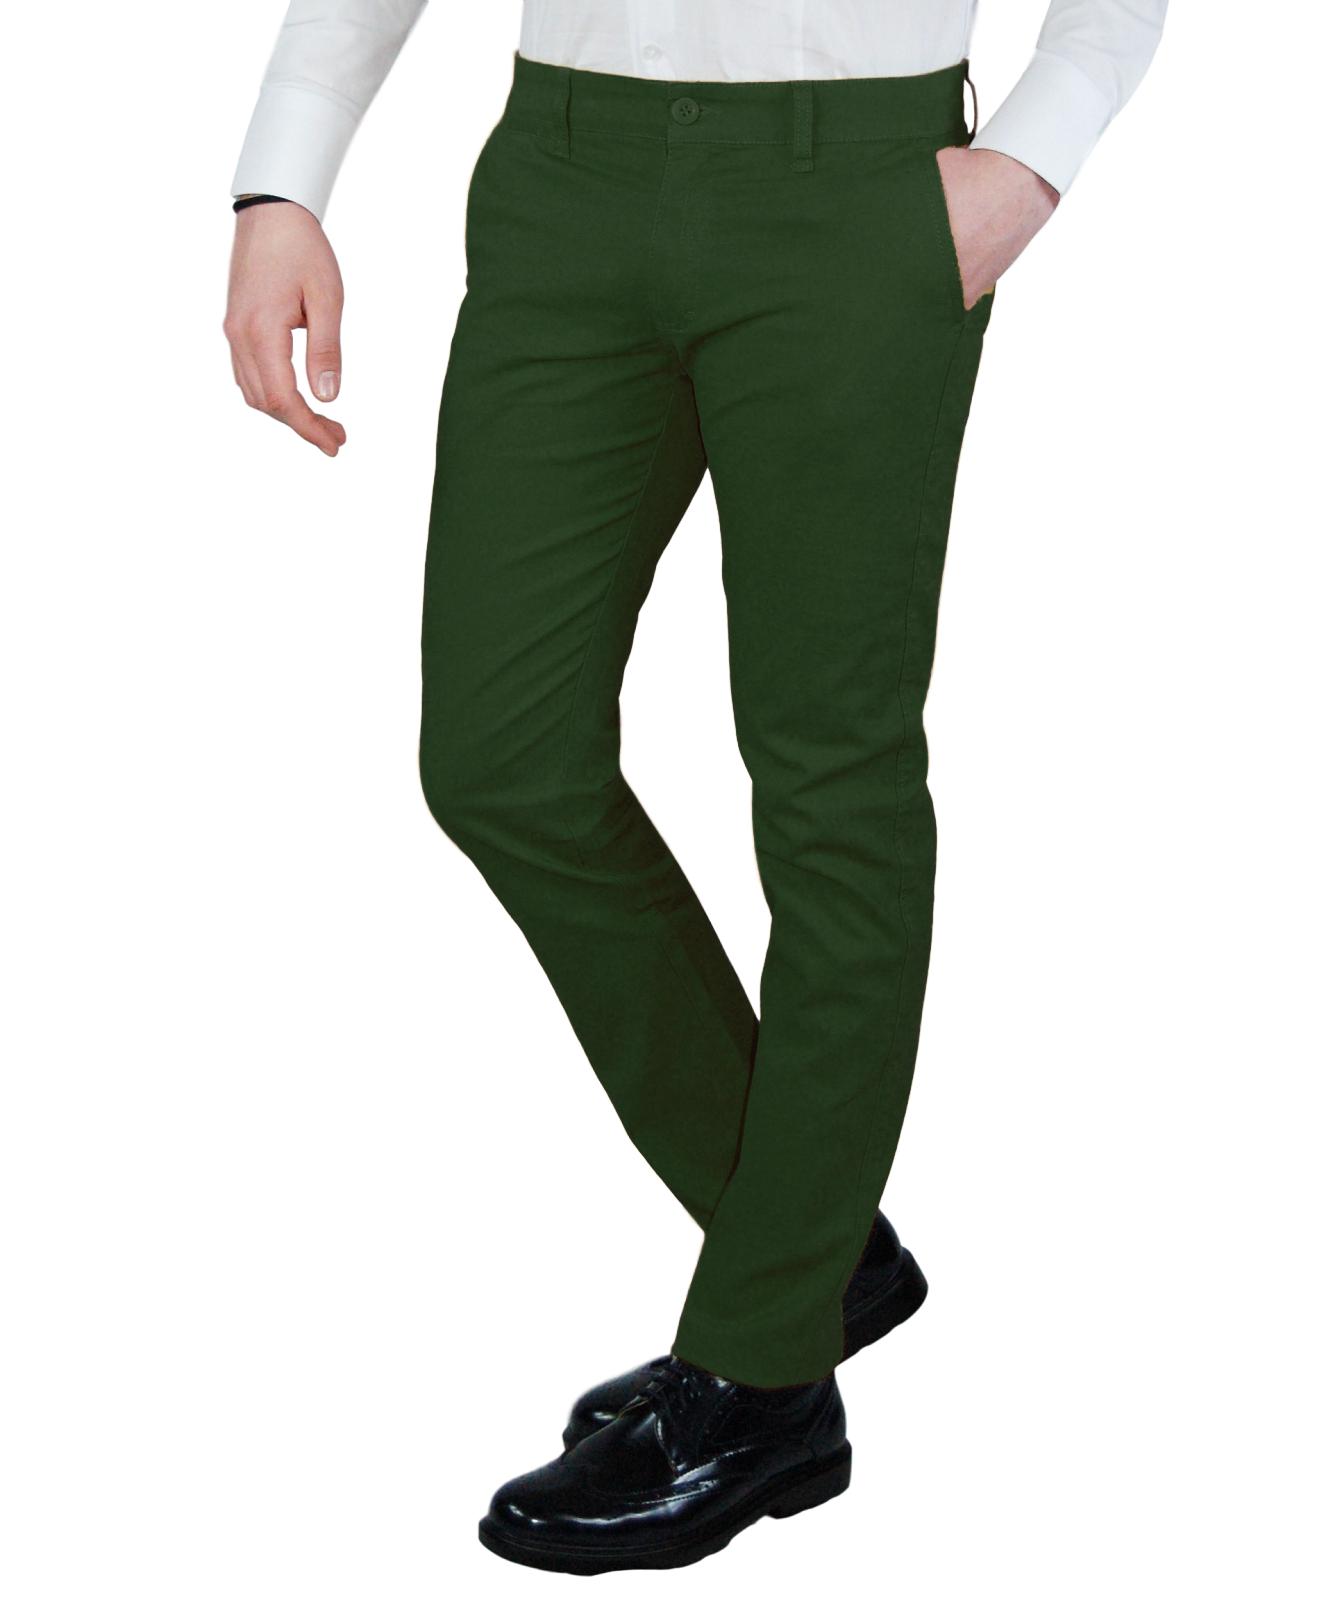 Pantalone-Uomo-Invernale-Slim-Fit-Chino-tasca-america-Cotone-Blu-Nero-Verde miniatura 22